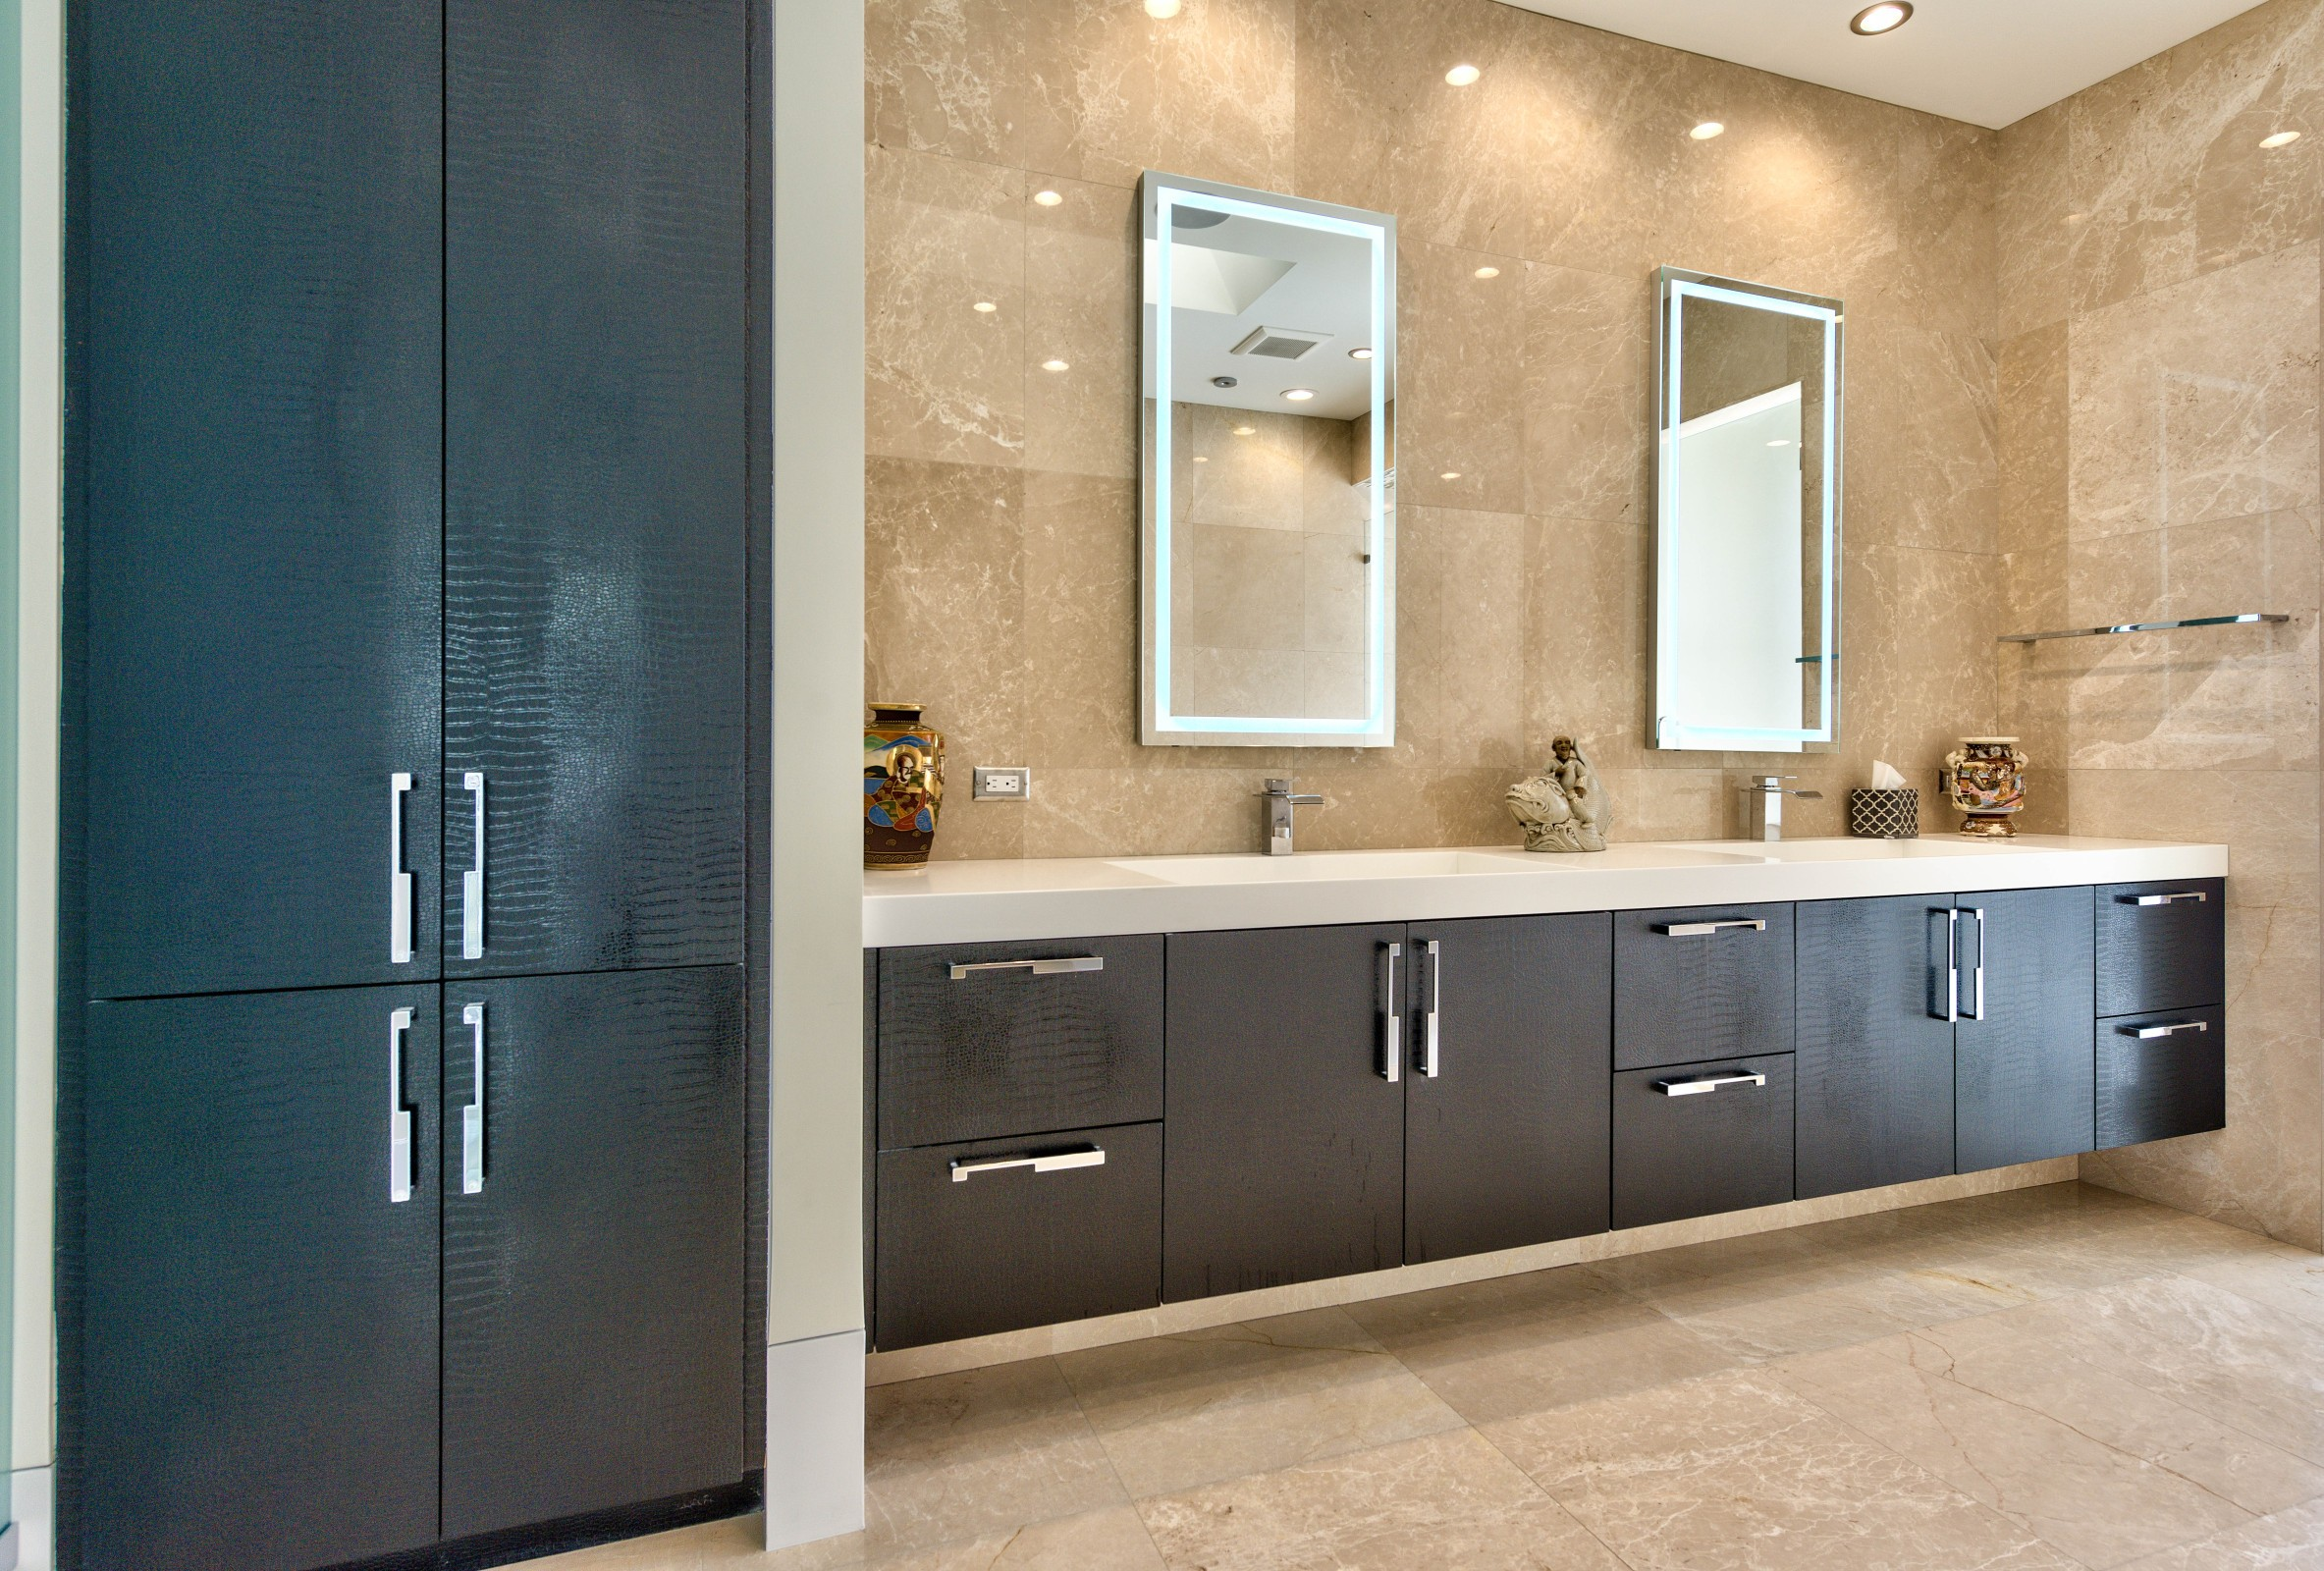 Terrific Bathroom Remodel Naples Fl Wallpaper Design Ideas Gallery Image And